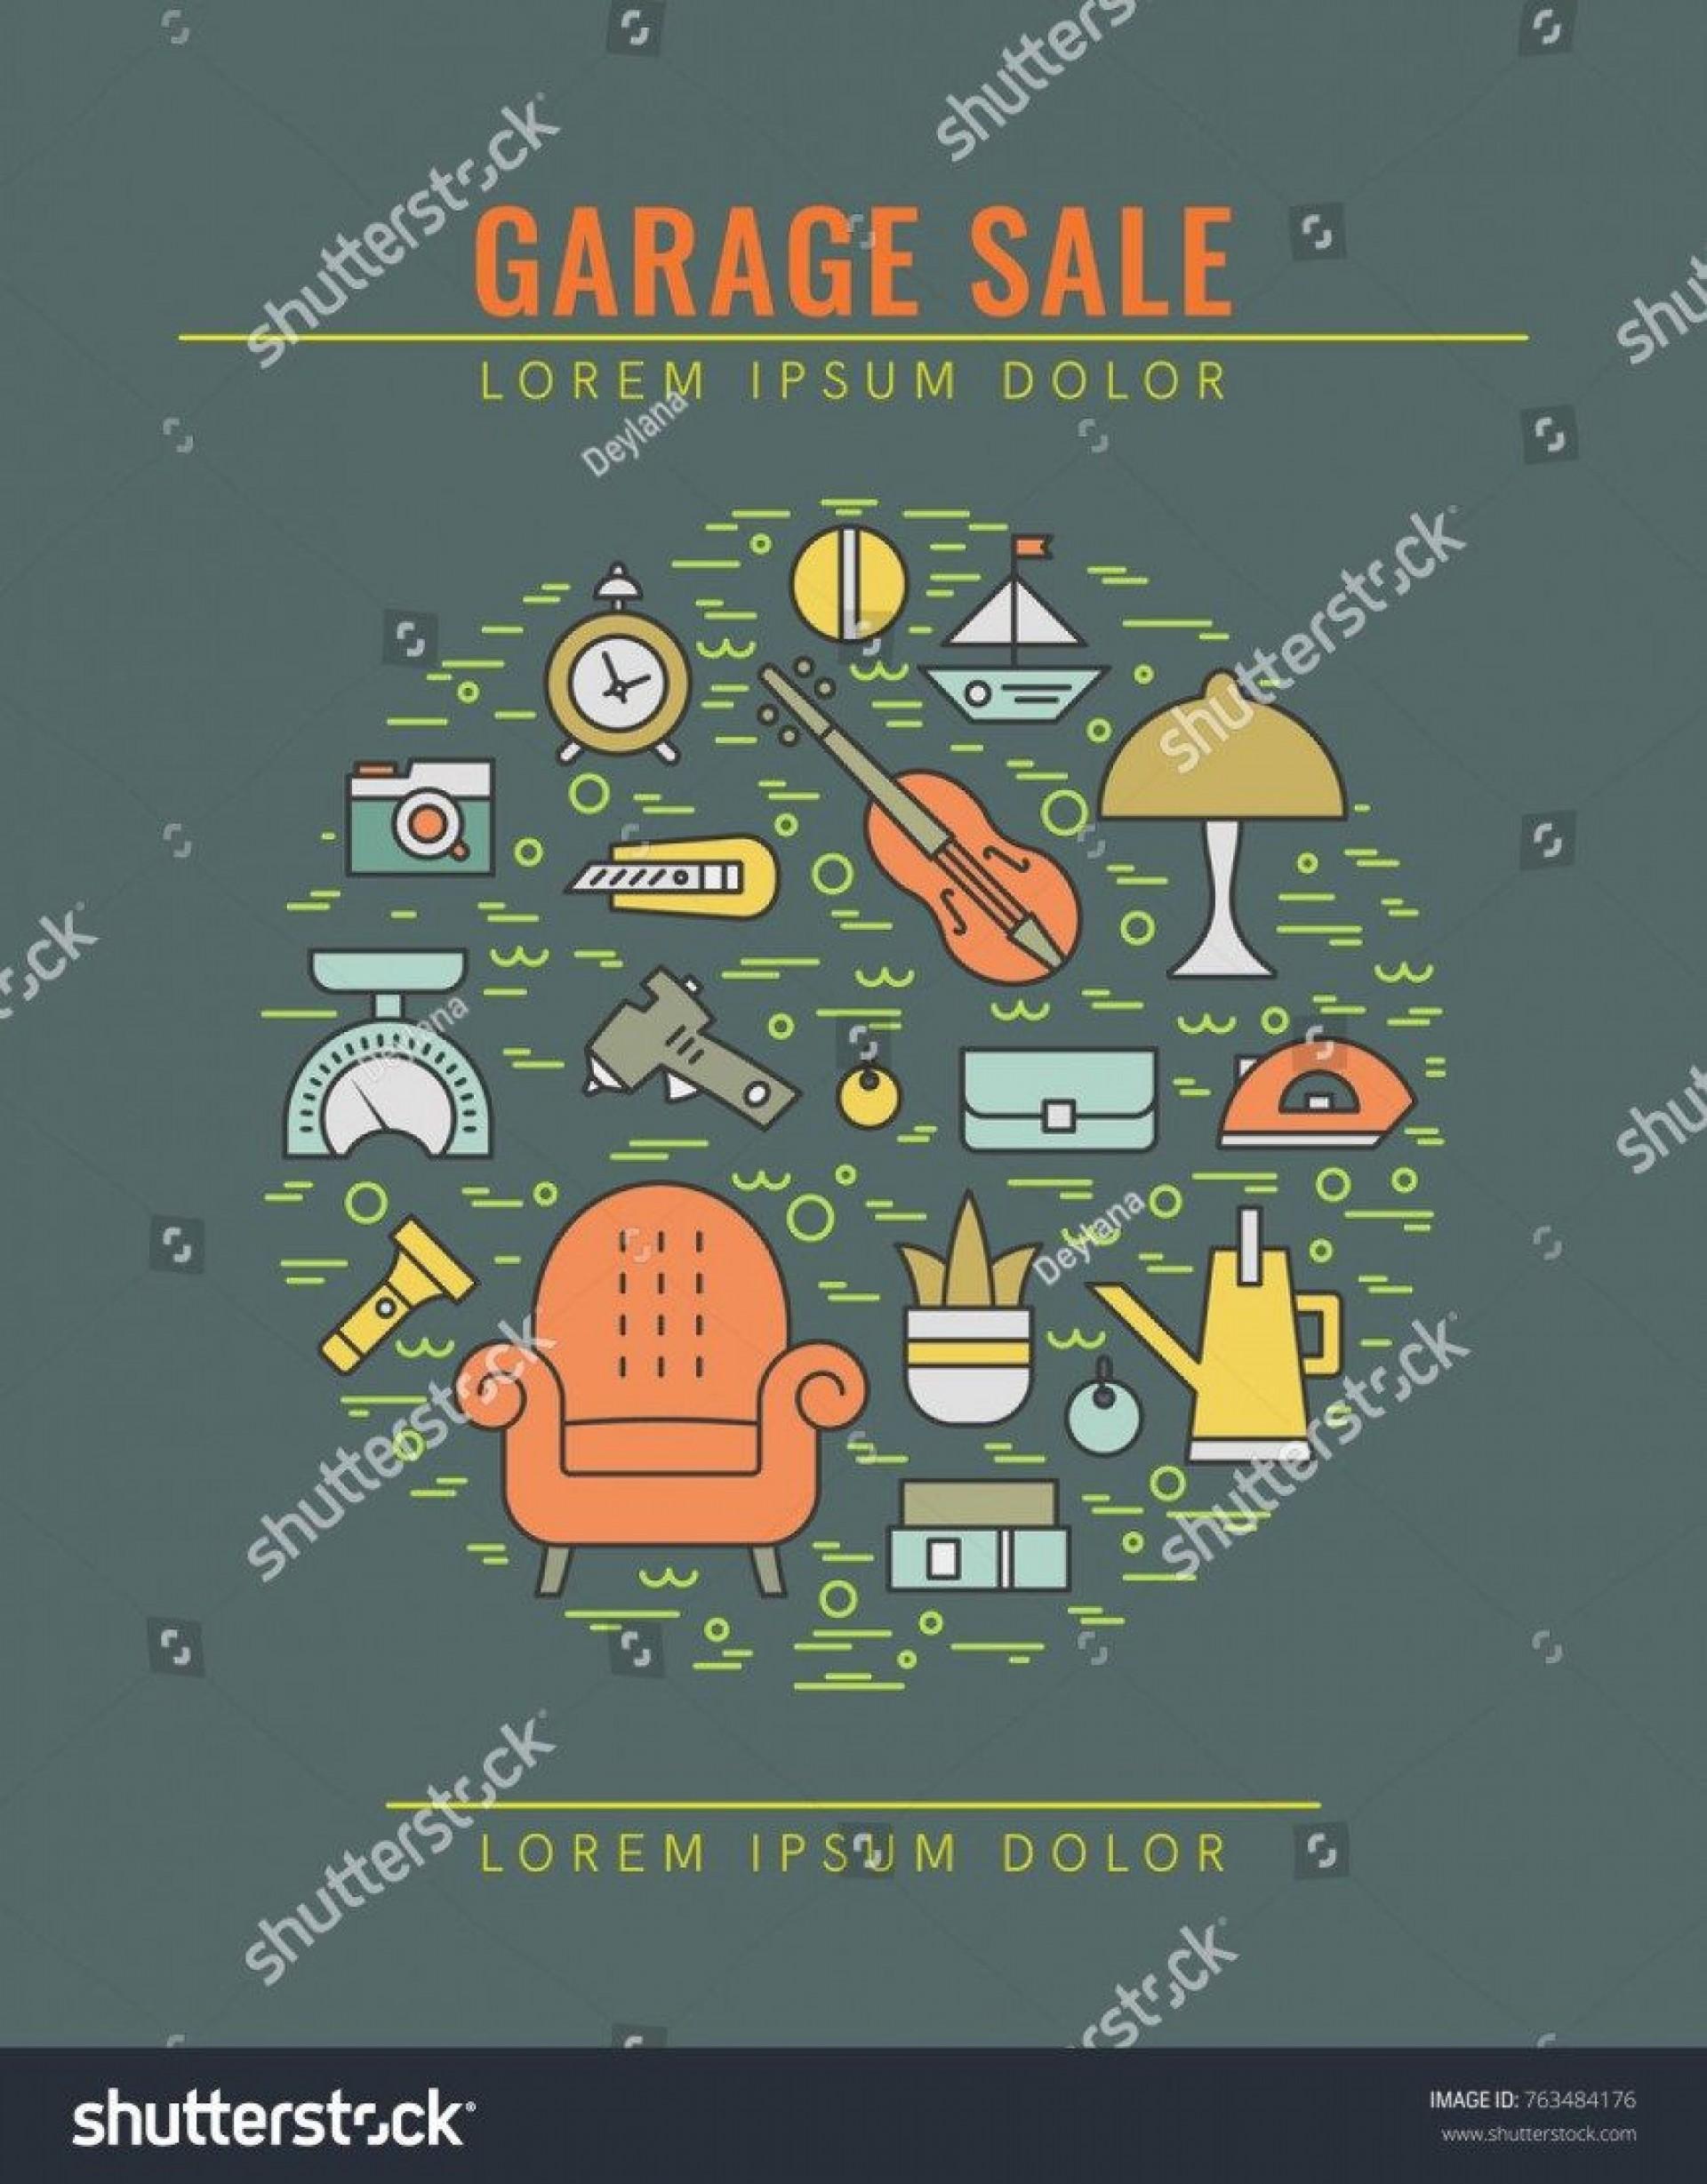 002 Unique Garage Sale Flyer Template Free Photo  Community Neighborhood Yard1920